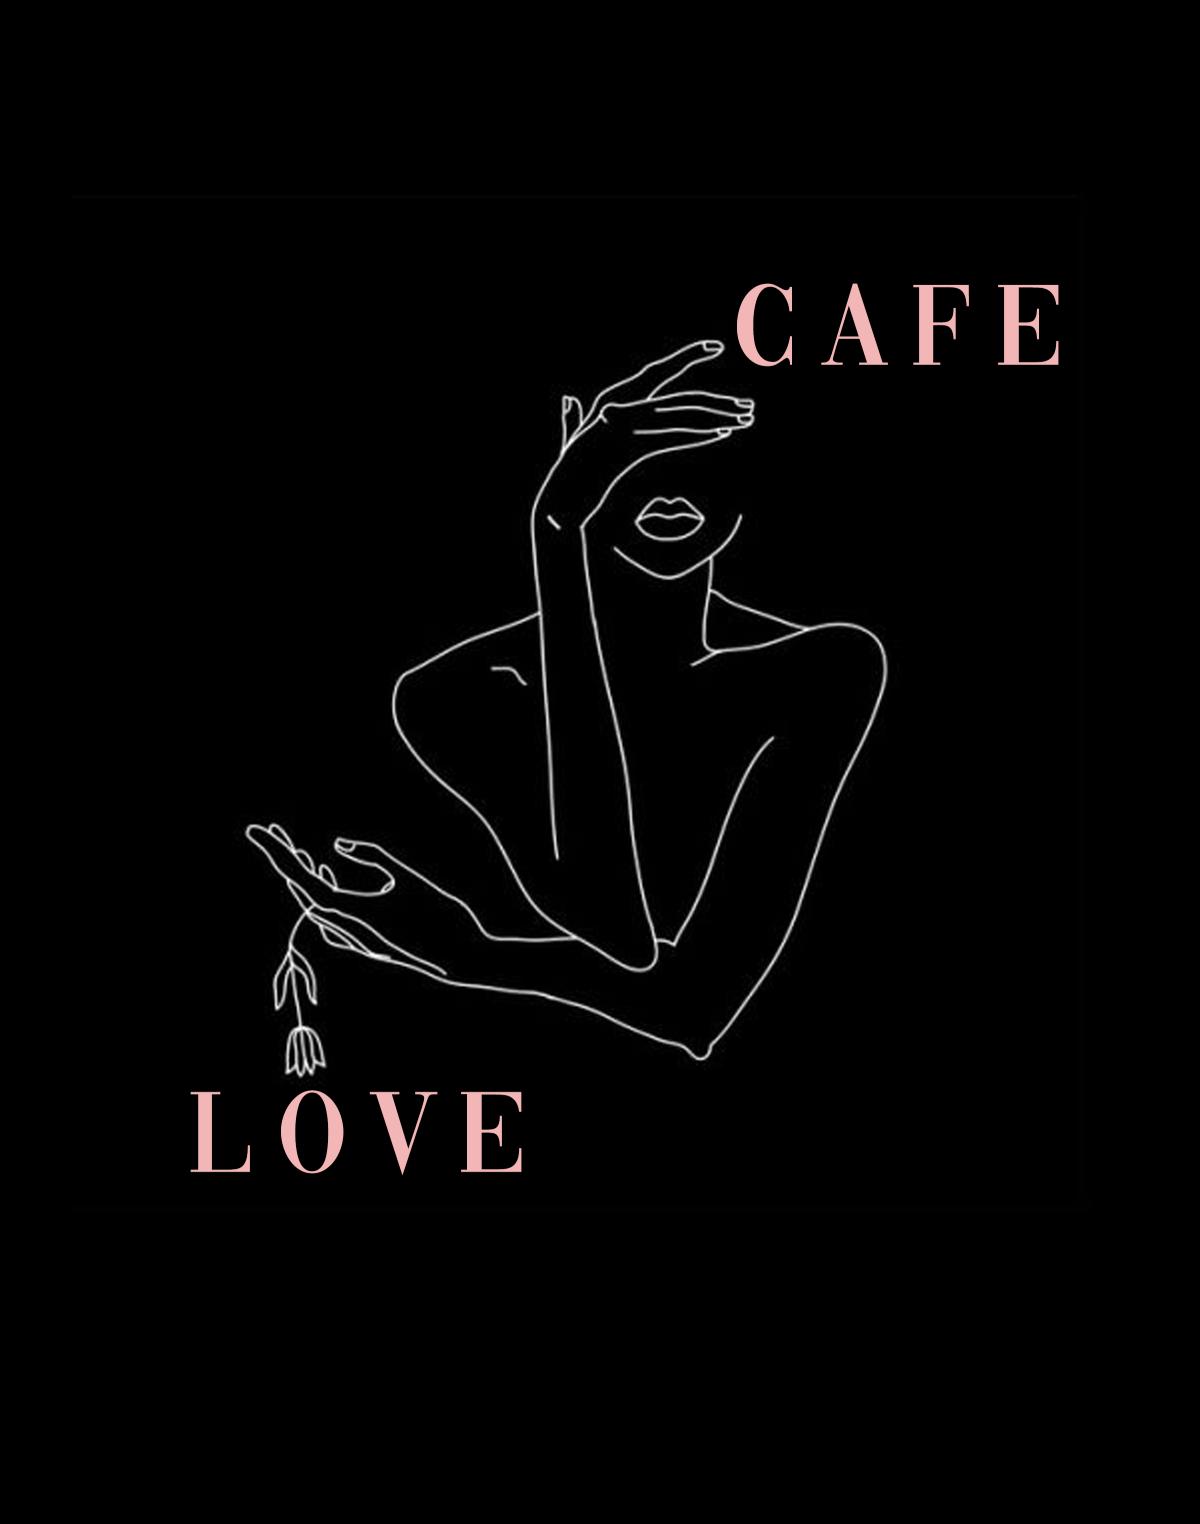 LOVE CAFÉ: Capítulo 1: en busca de esealgo